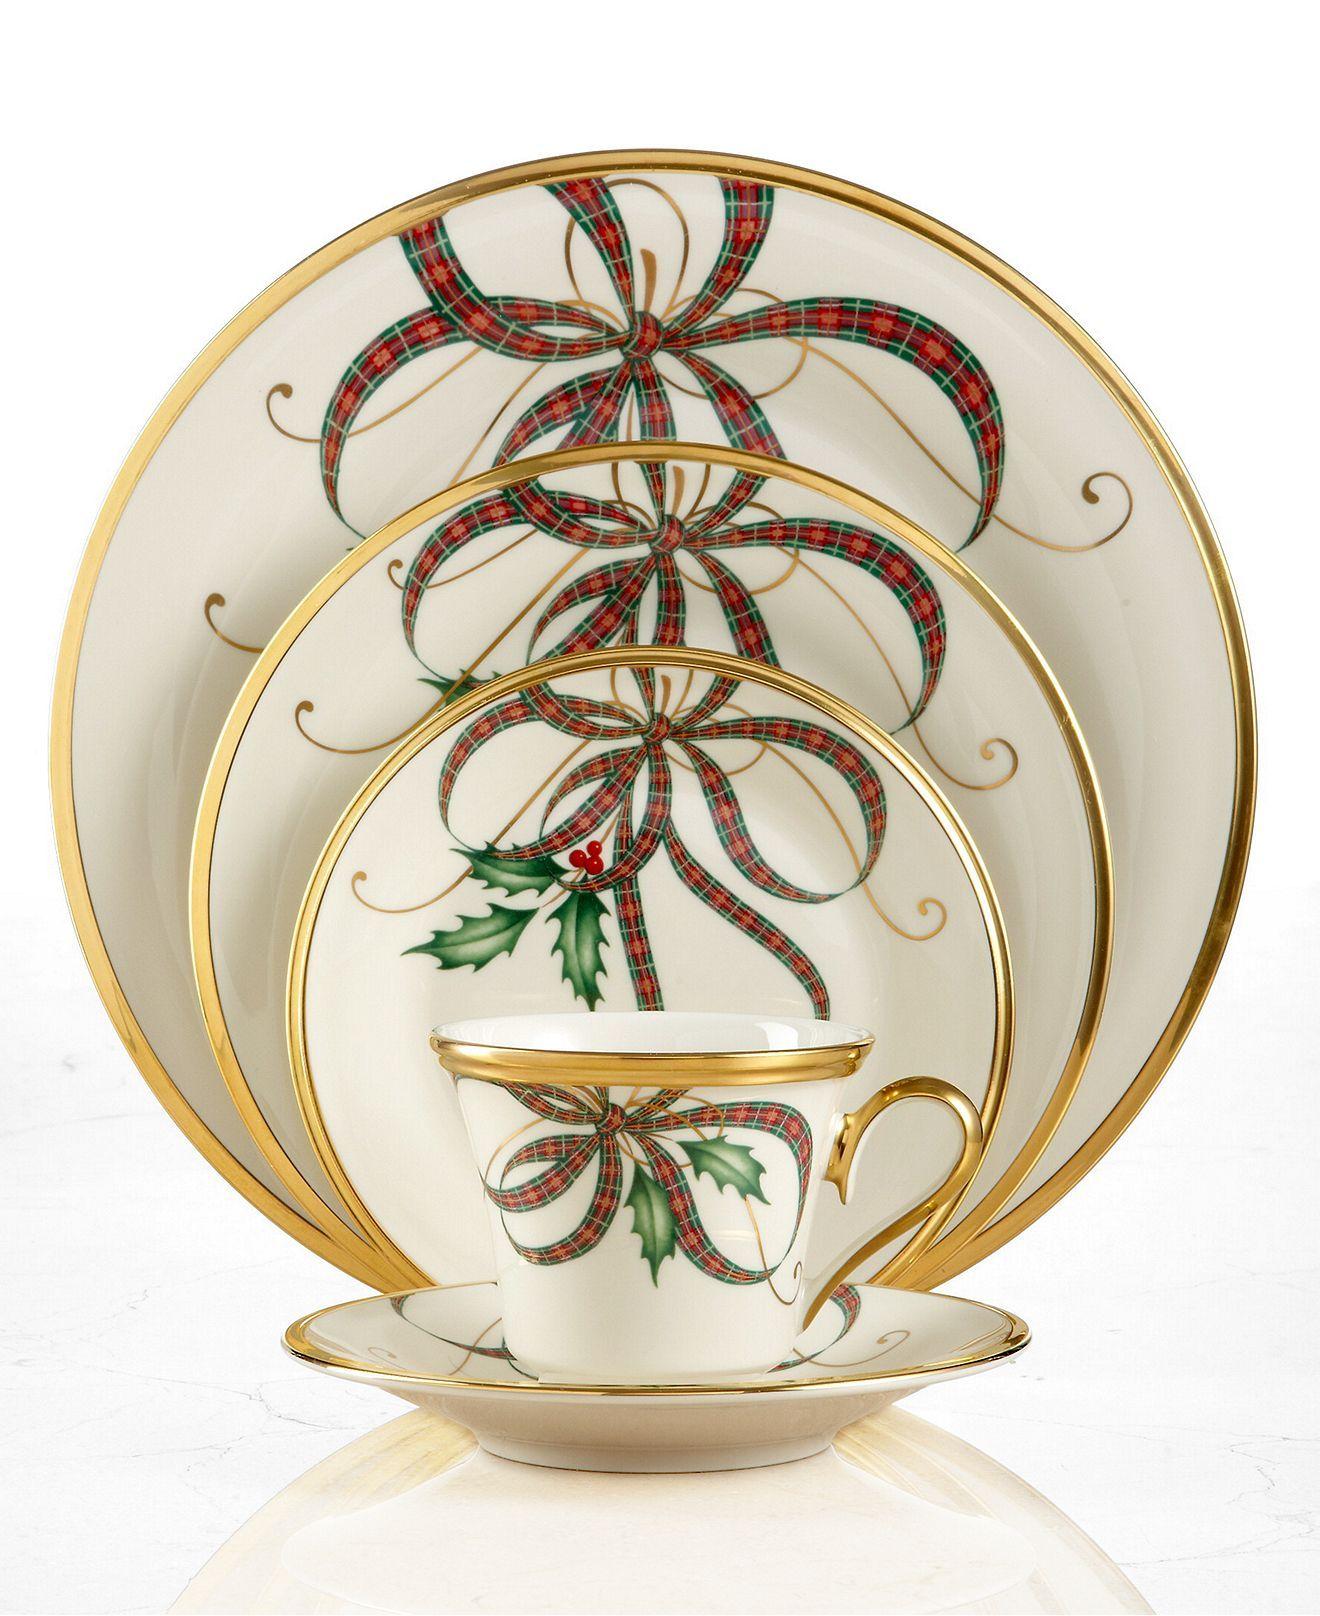 Lenox Holiday Nouveau Ribbon Lenoxholiday Christmas China Patterns Christmas Dinnerware Christmas China